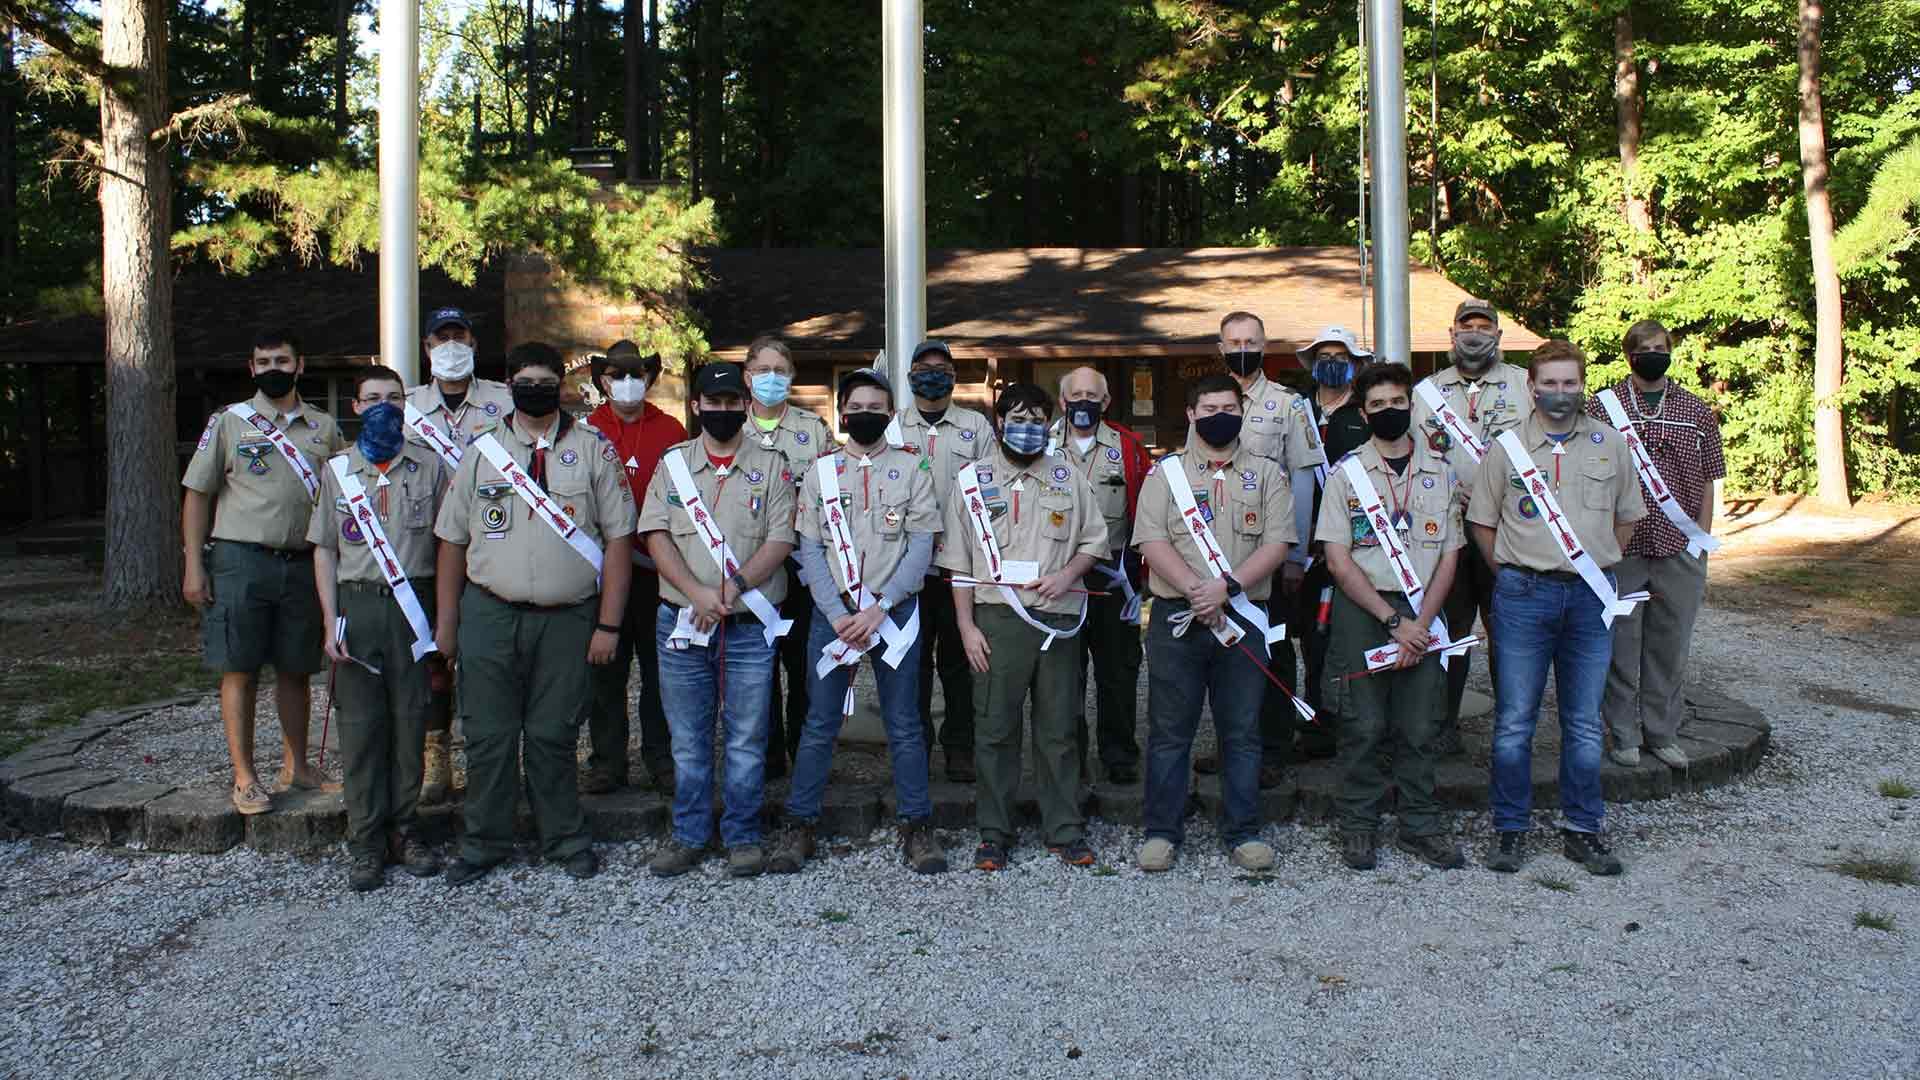 new Vigil members of Jaccos Towne Lodge